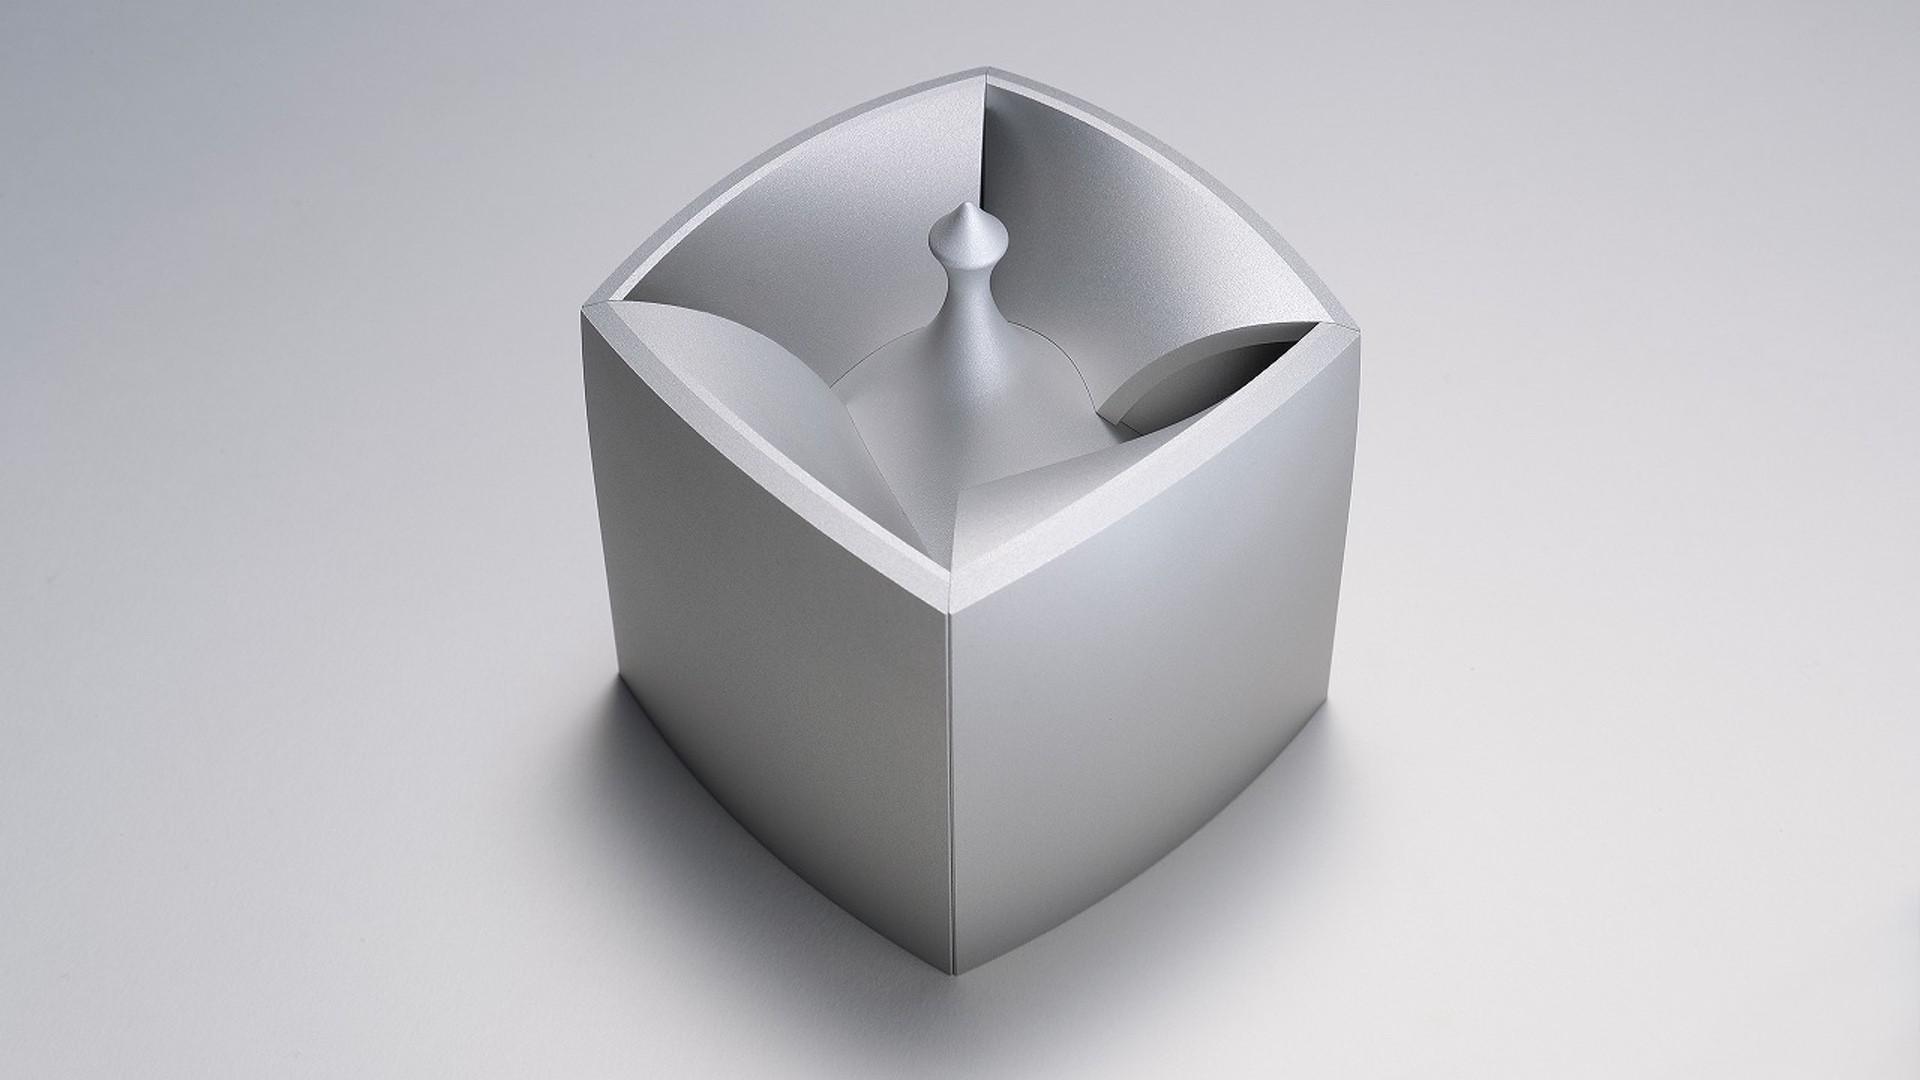 4Design_BBS_F1_chocolate_wheels-0003